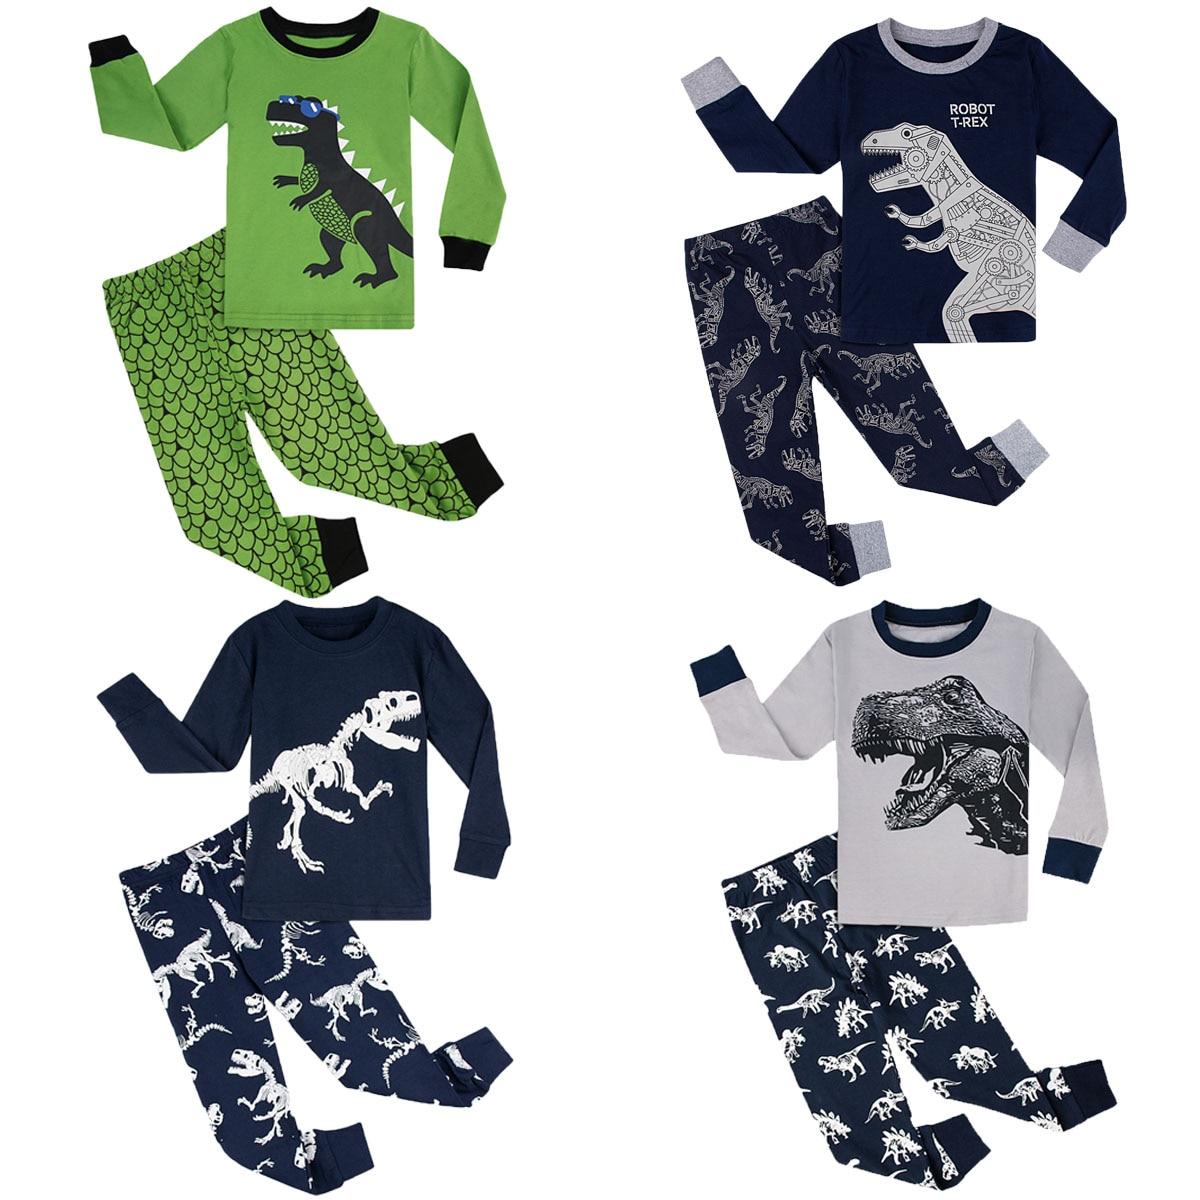 Blue Jellyfish Girl Cotton Crewneck Boys-Girls Sleepwear Pajama 2 Pcs Set